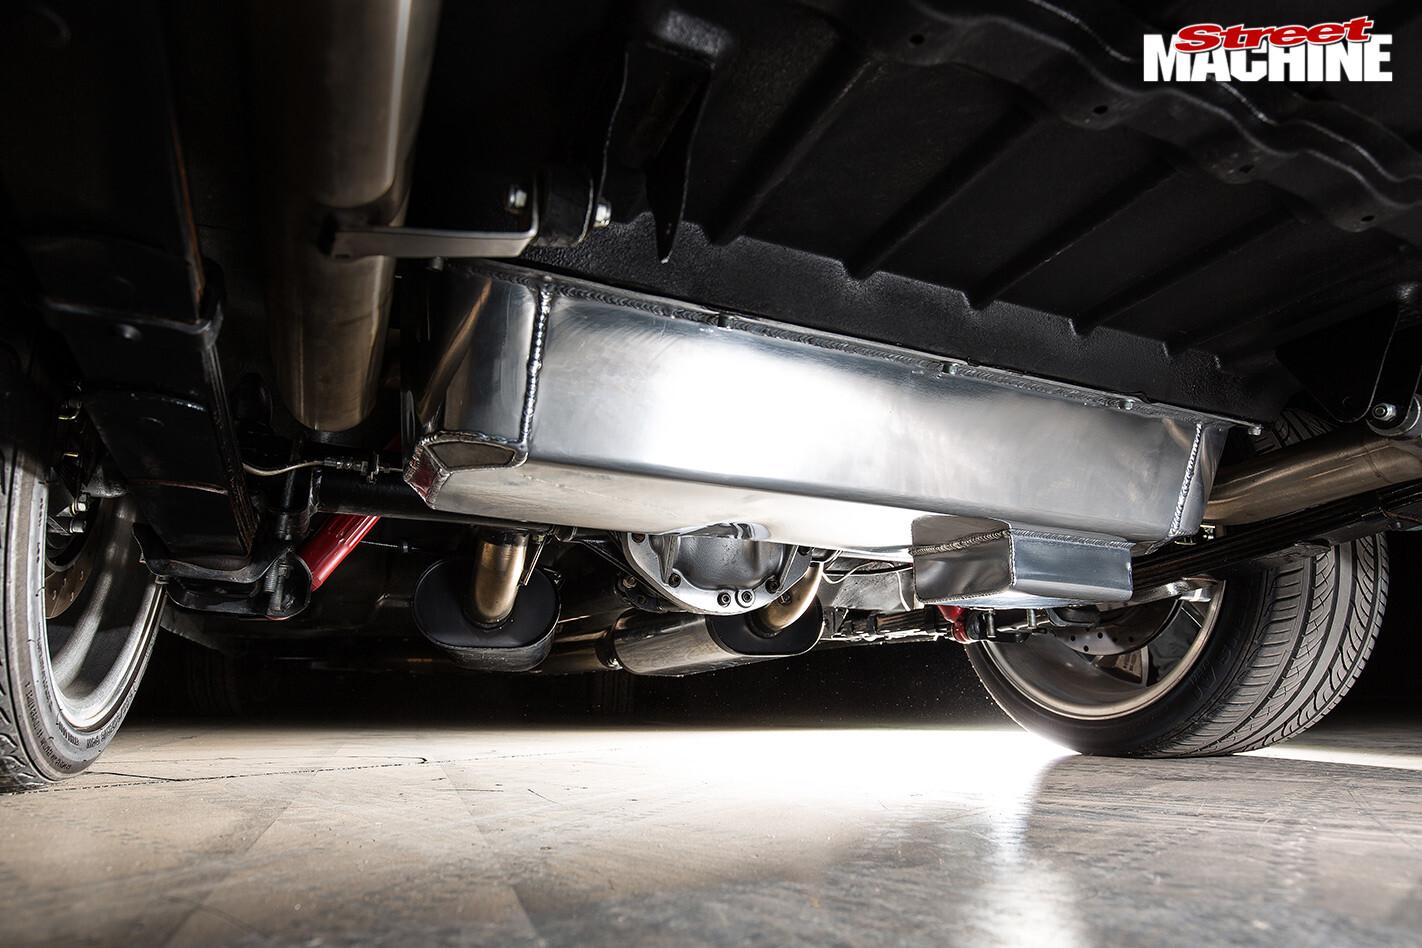 Holden HK wagon fuel tank